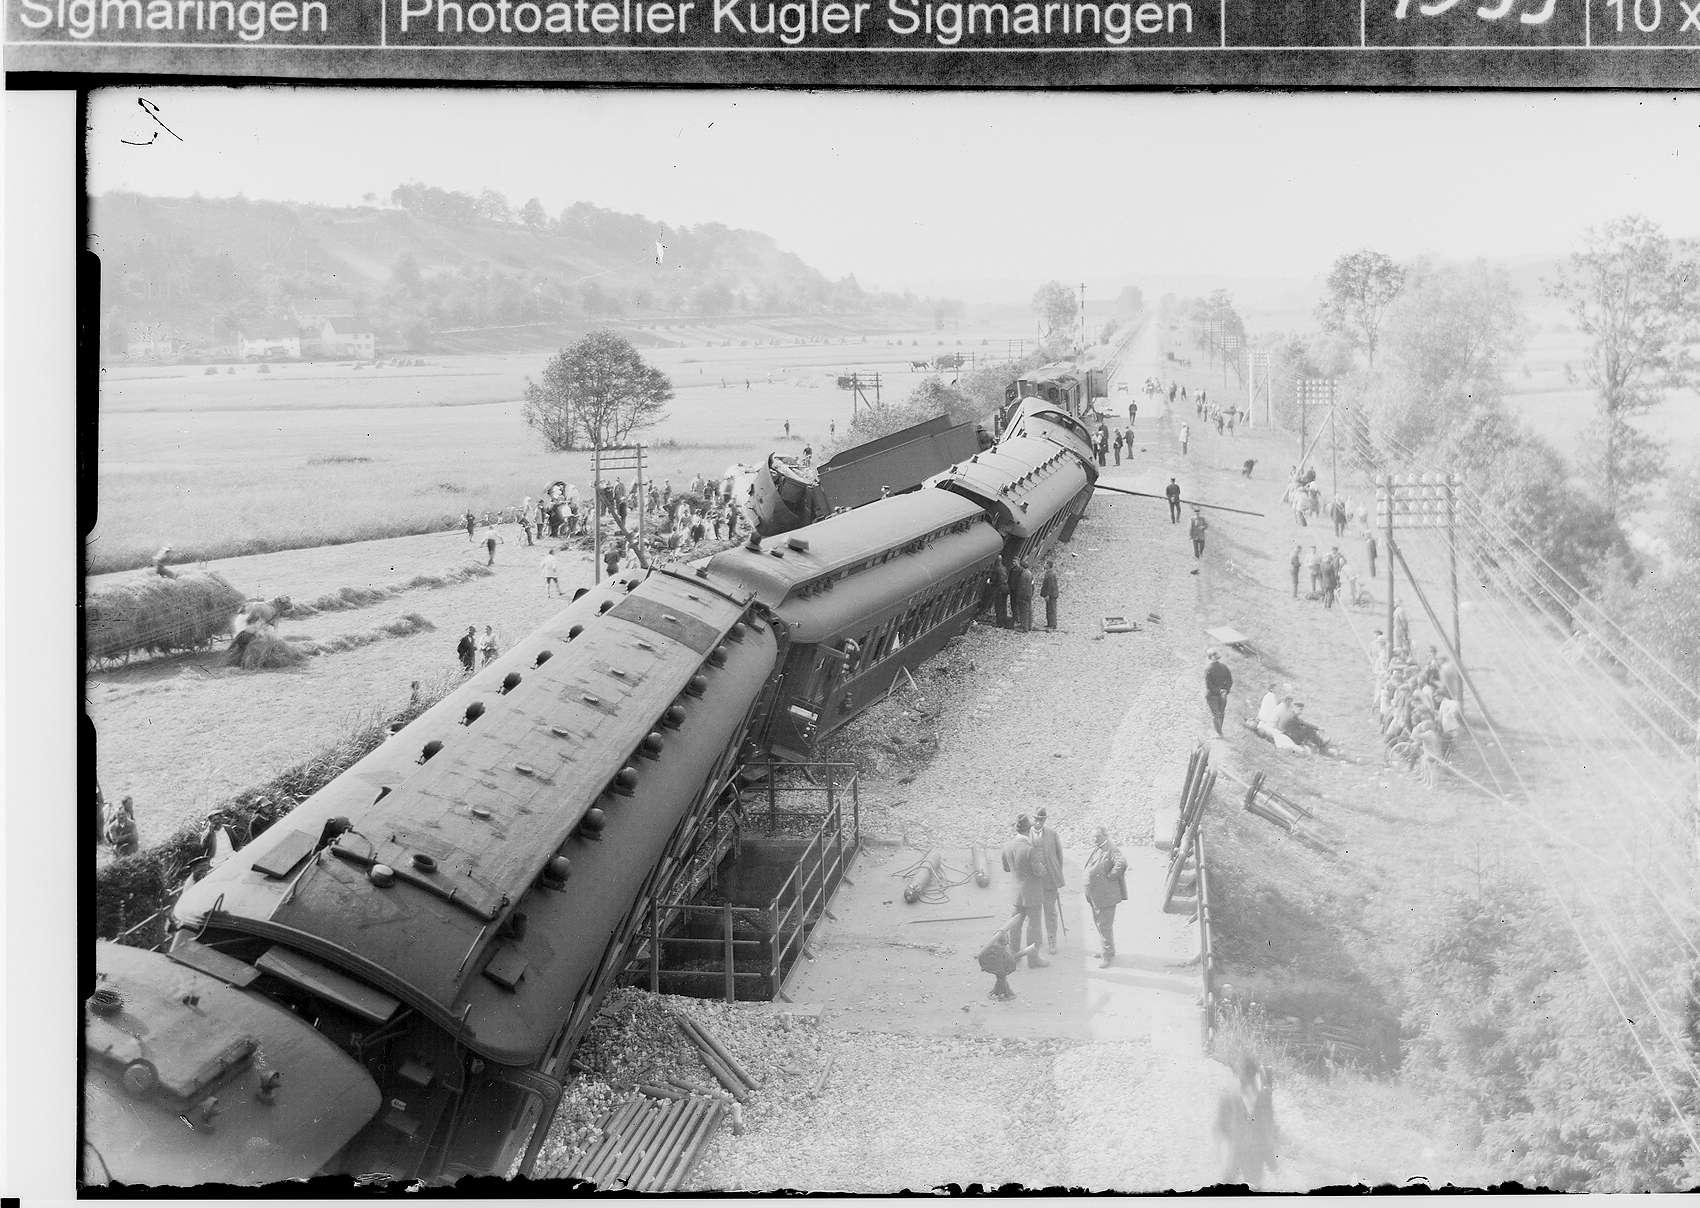 Zugunglück Ummendorf, Bild 1